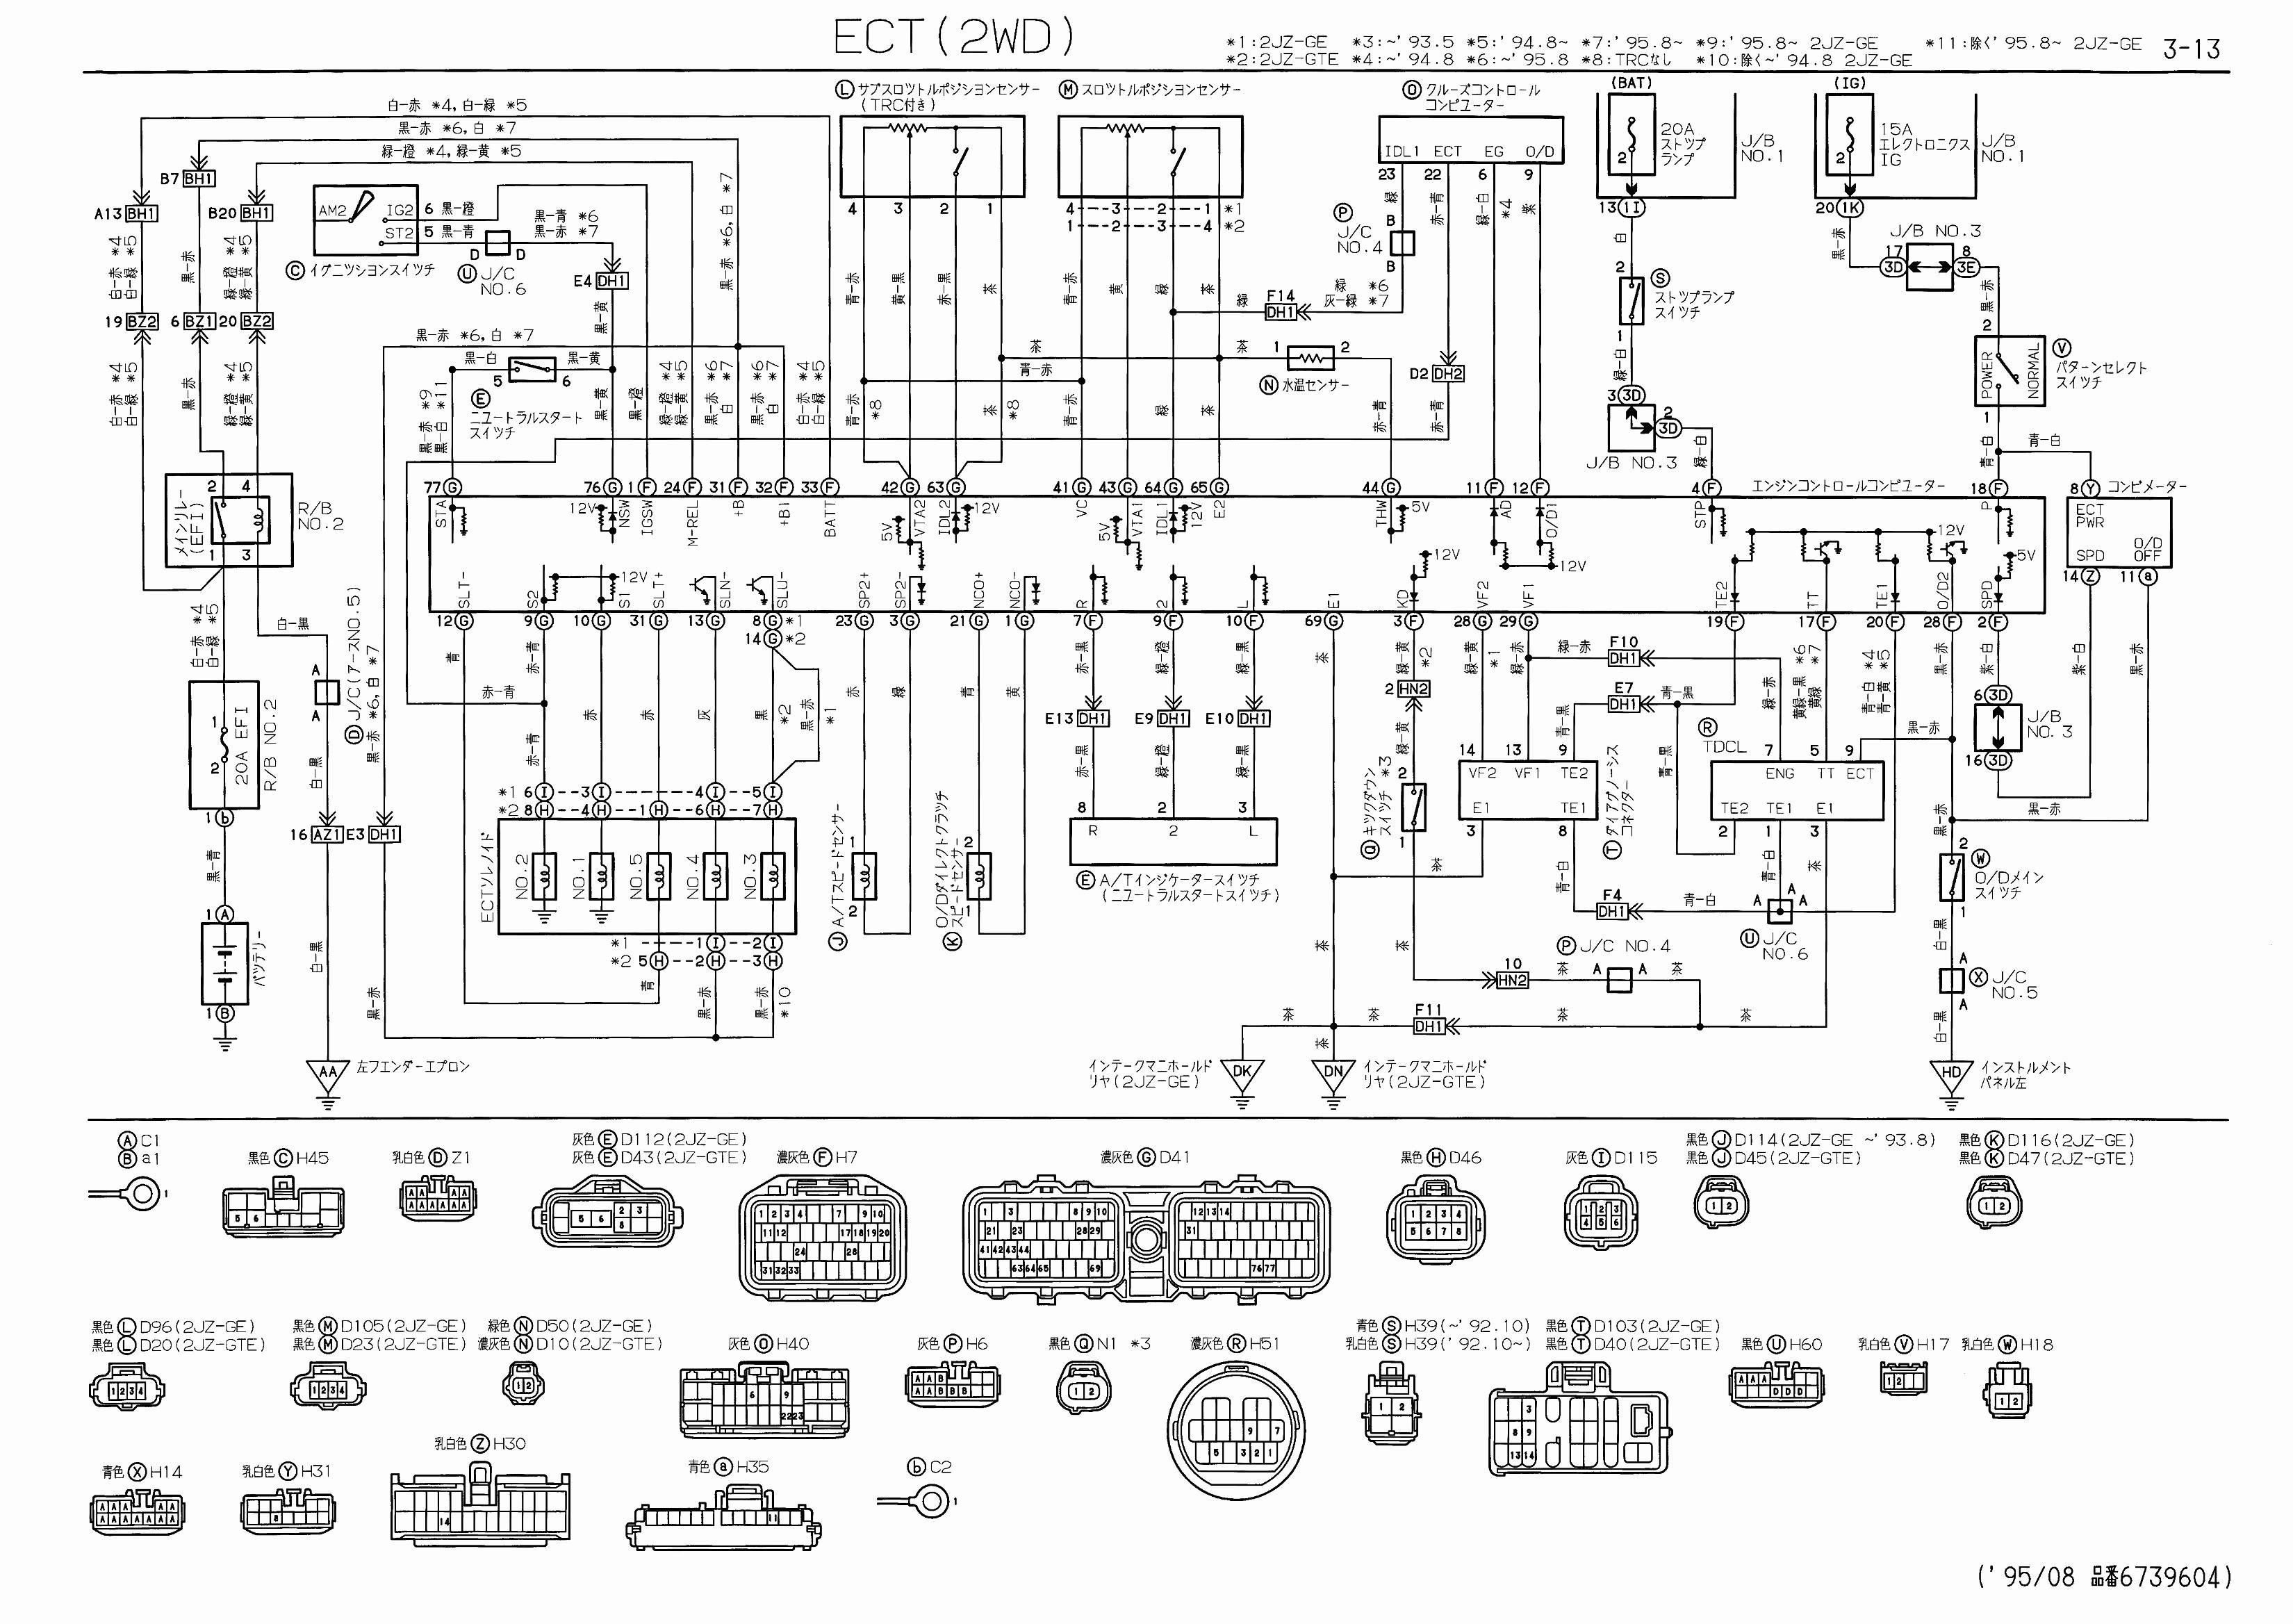 2000 Infiniti I30 Engine Diagram Infiniti J30 Fuse Diagram Layout Wiring Diagrams • Of 2000 Infiniti I30 Engine Diagram